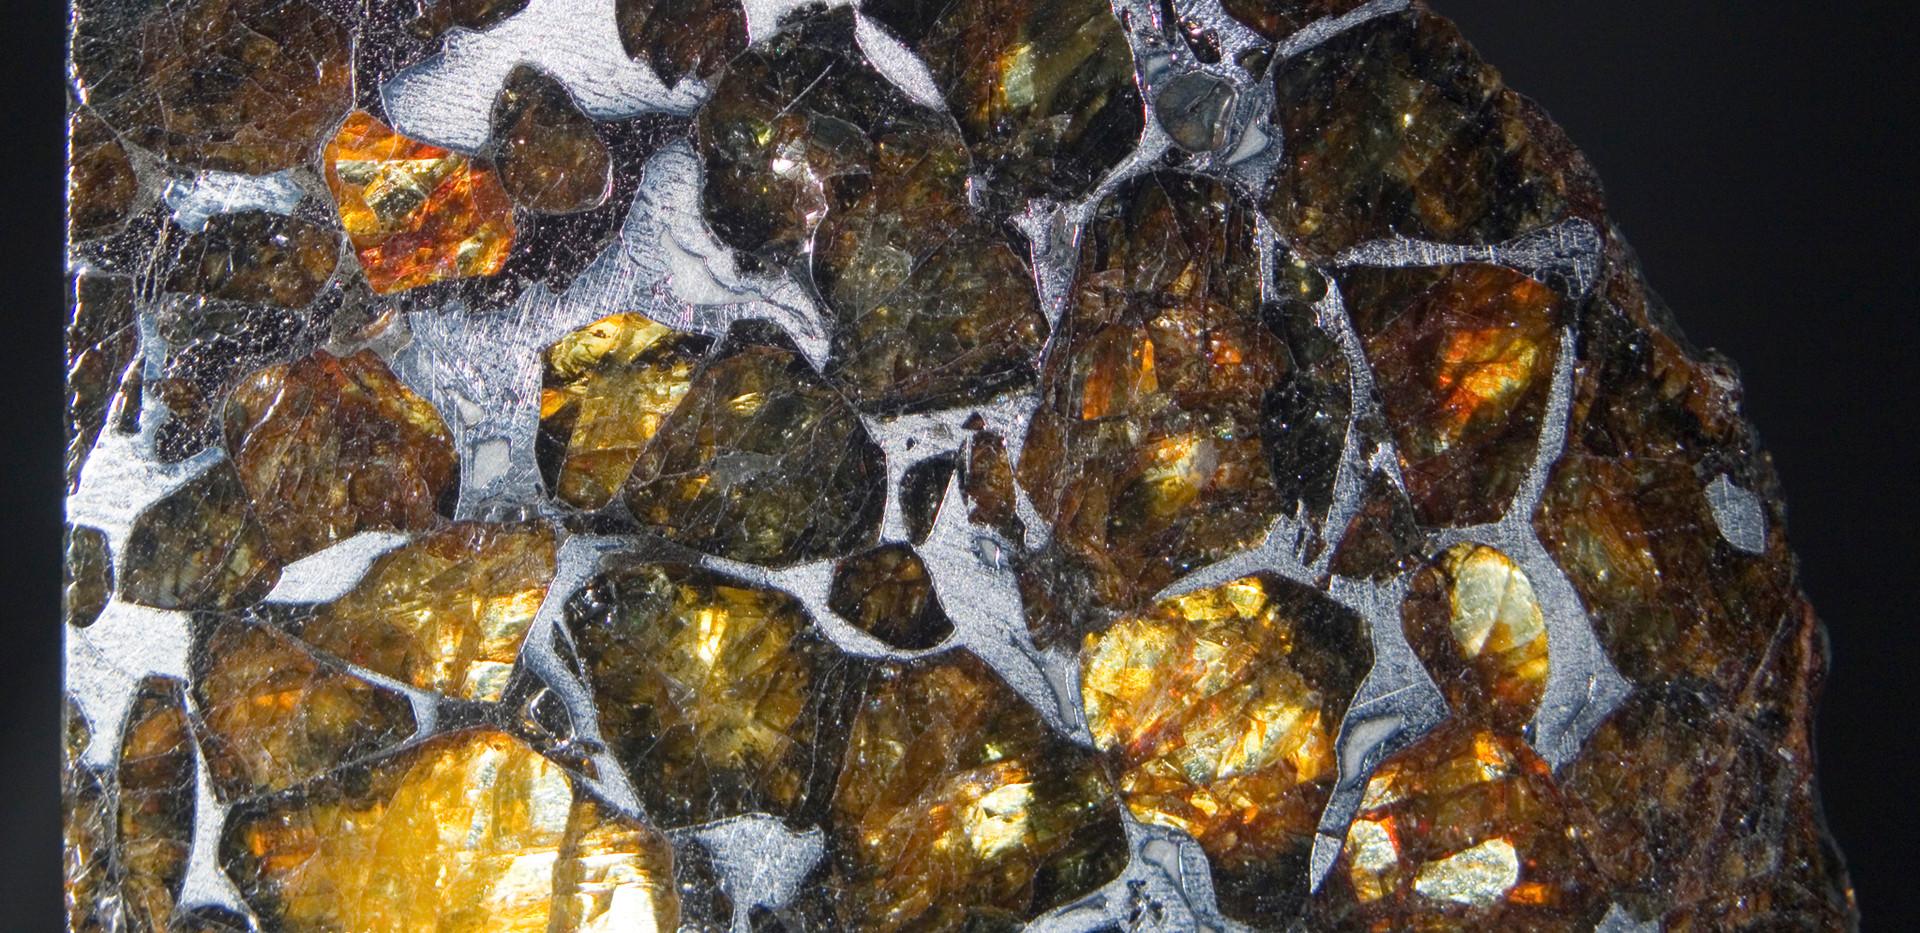 Pallasite Meteorite, Imilac, Back.  4.3 cm x 3 cm SMIM04